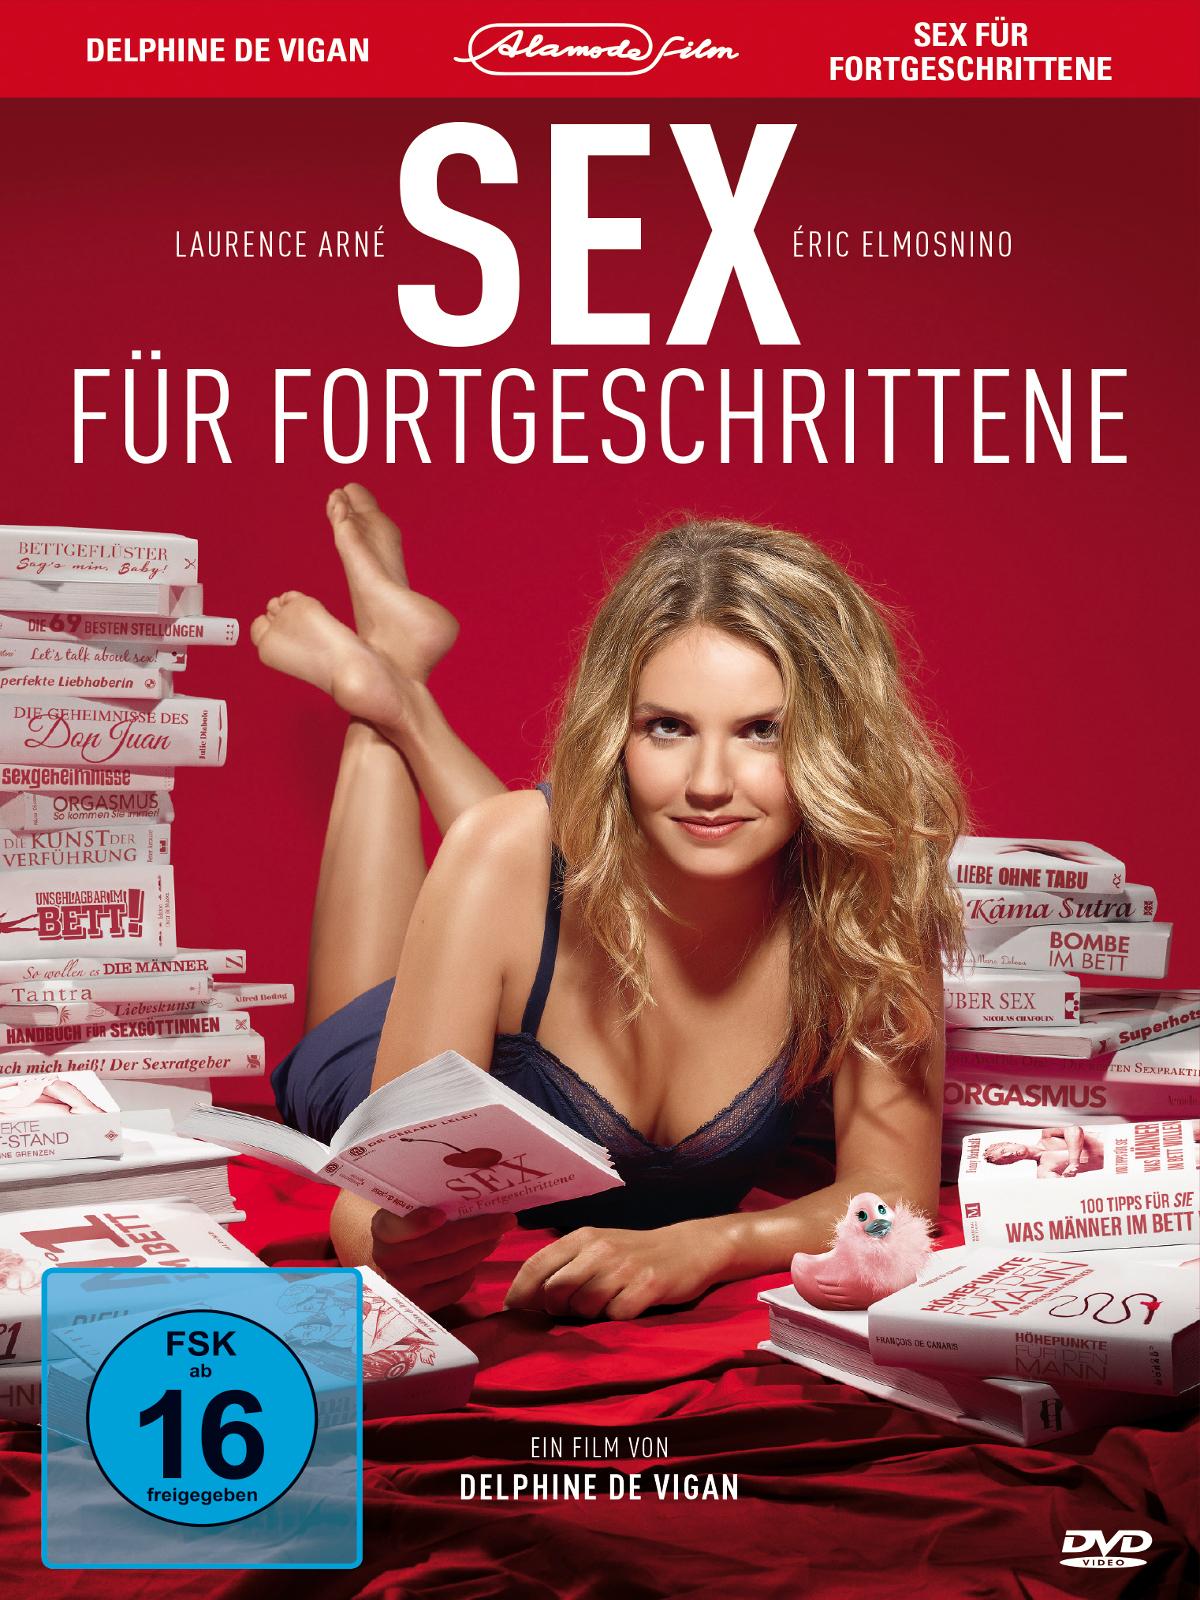 Spielfilme sex HD Sexfilme